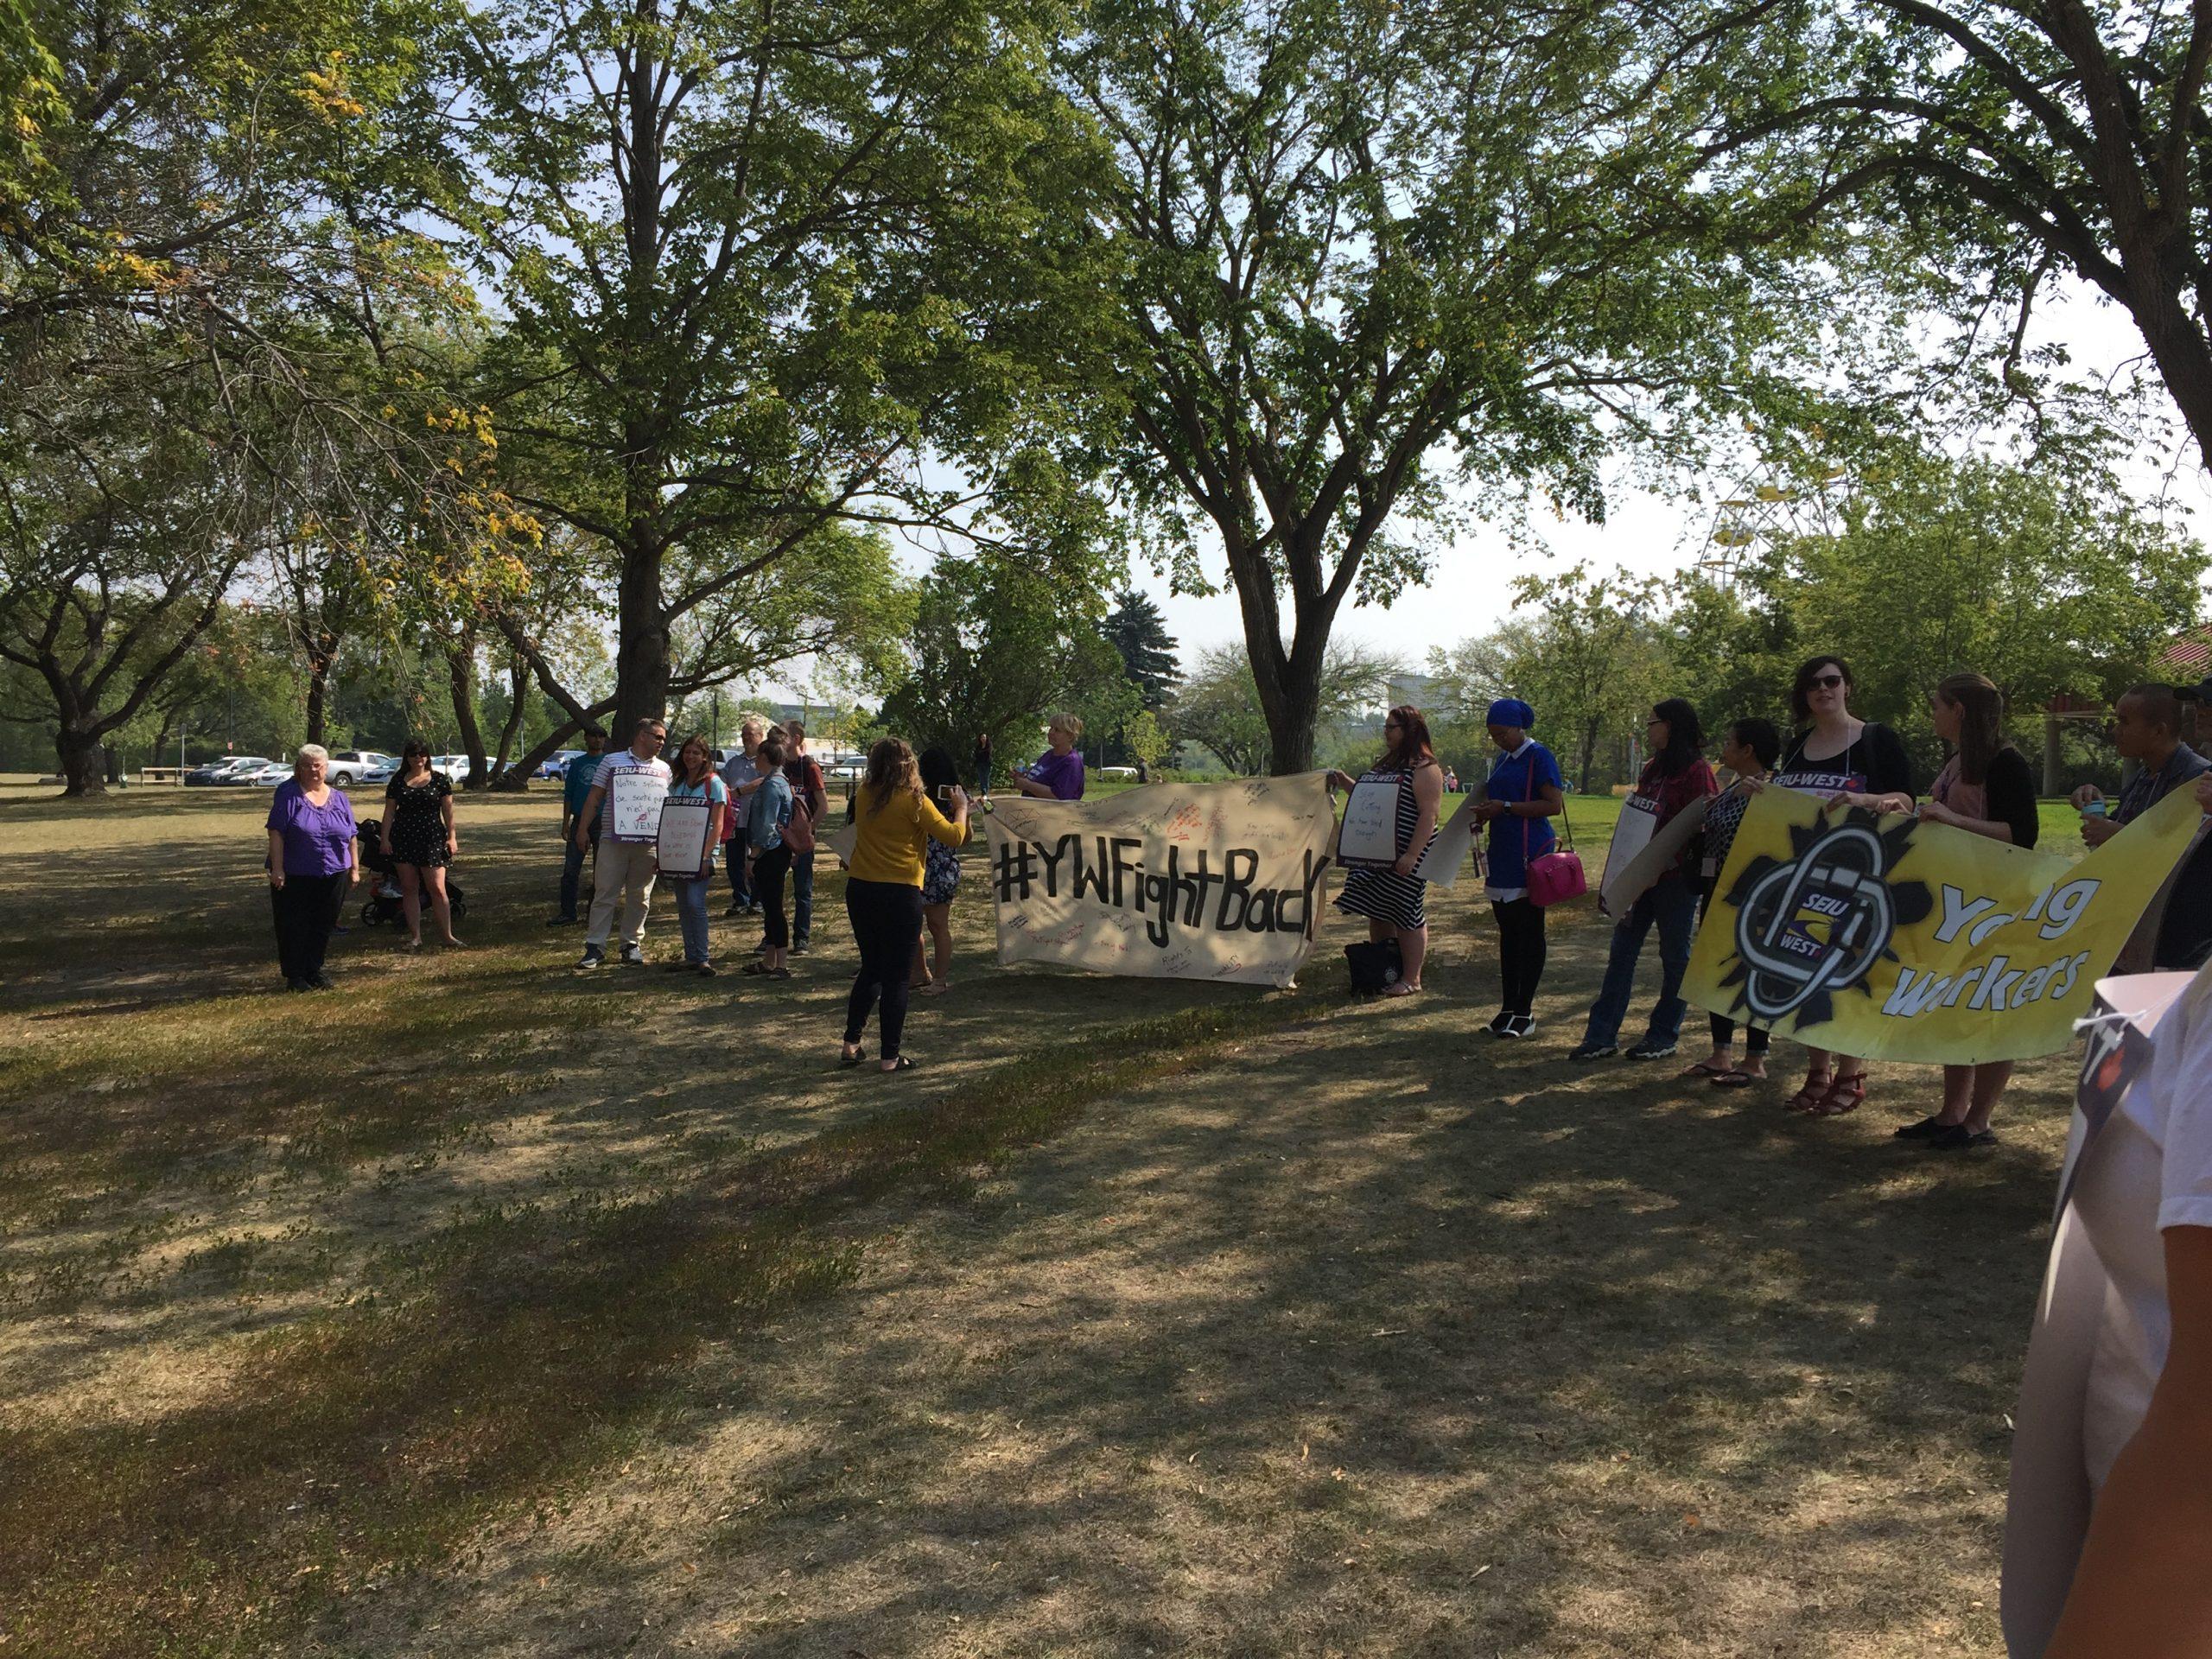 Saskatoon Protest Highlights Cuts to Public Service